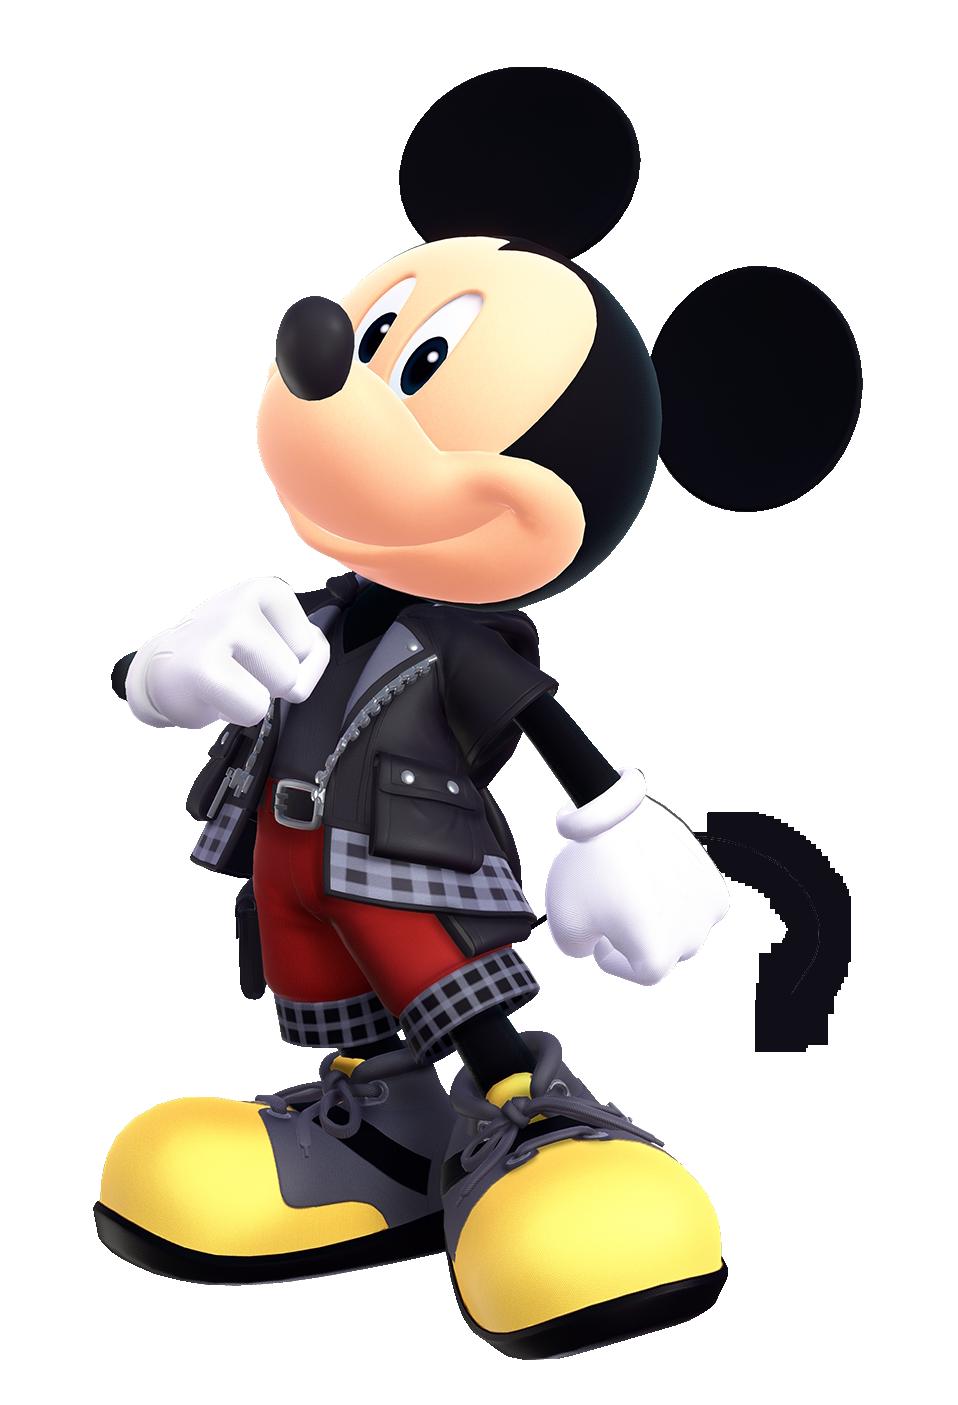 42630039e0c9 Mickey Mouse | Kingdom Hearts Wiki | FANDOM powered by Wikia